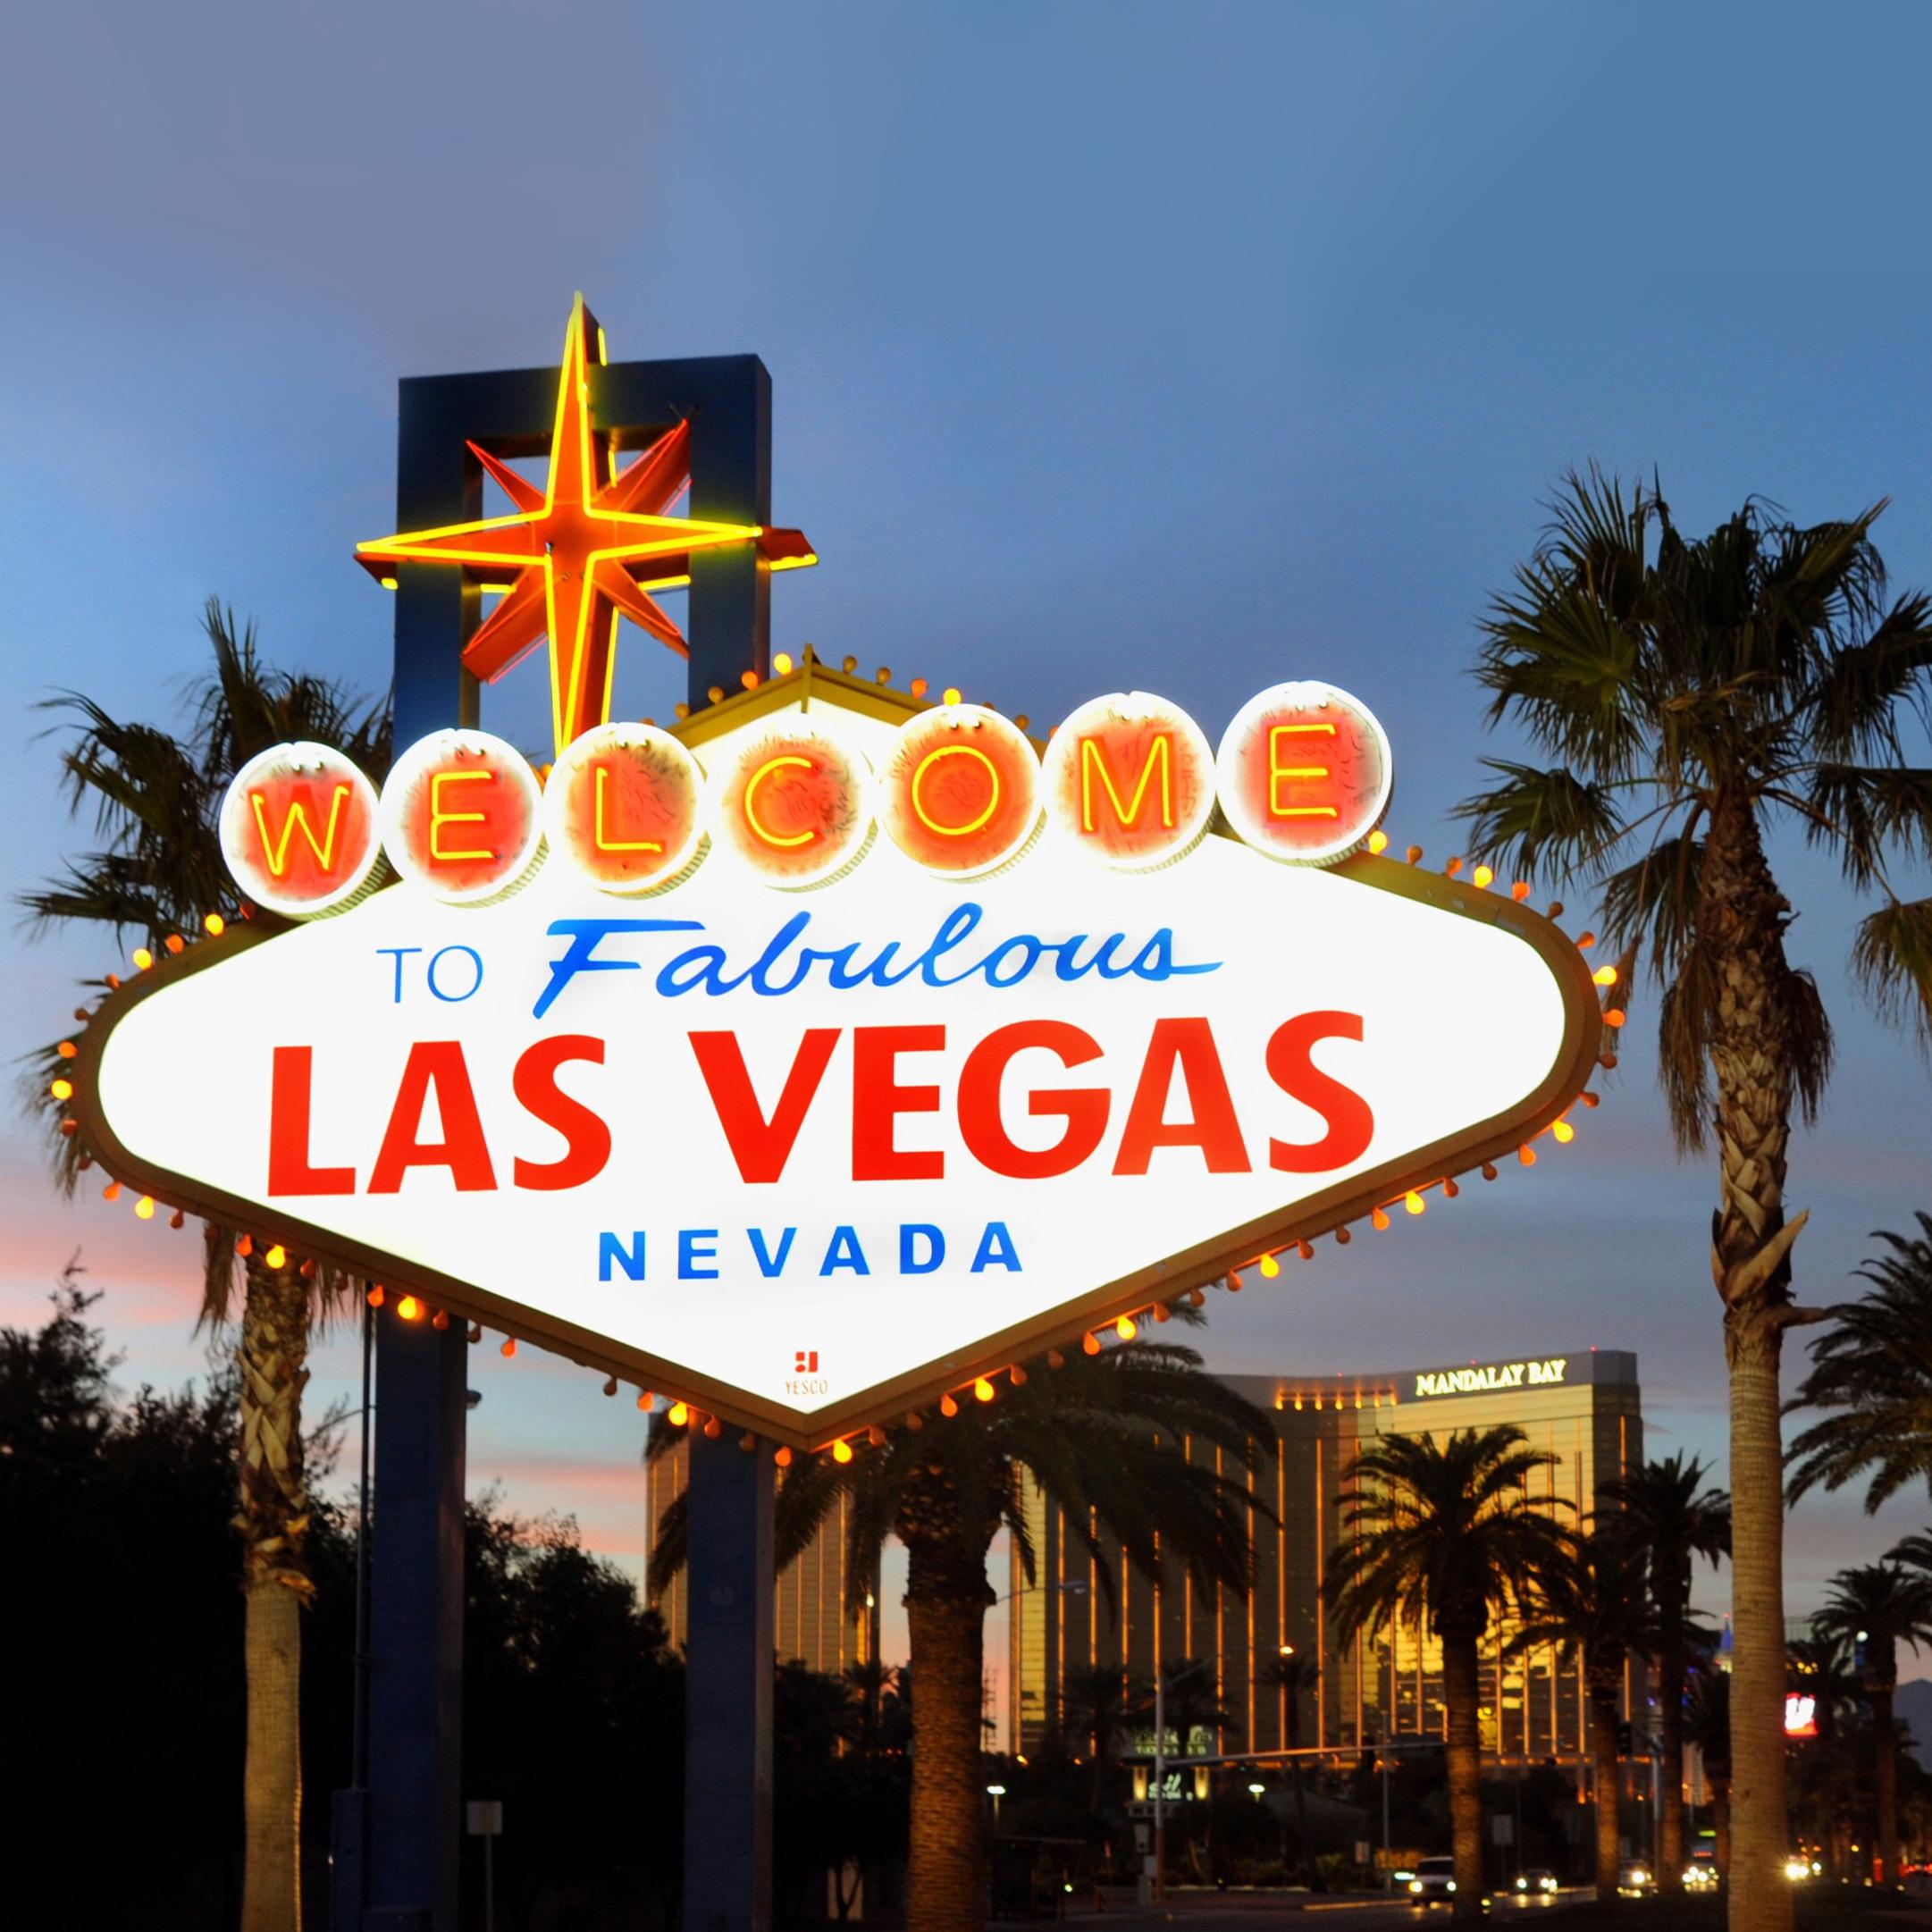 14-Las Vegas.jpg